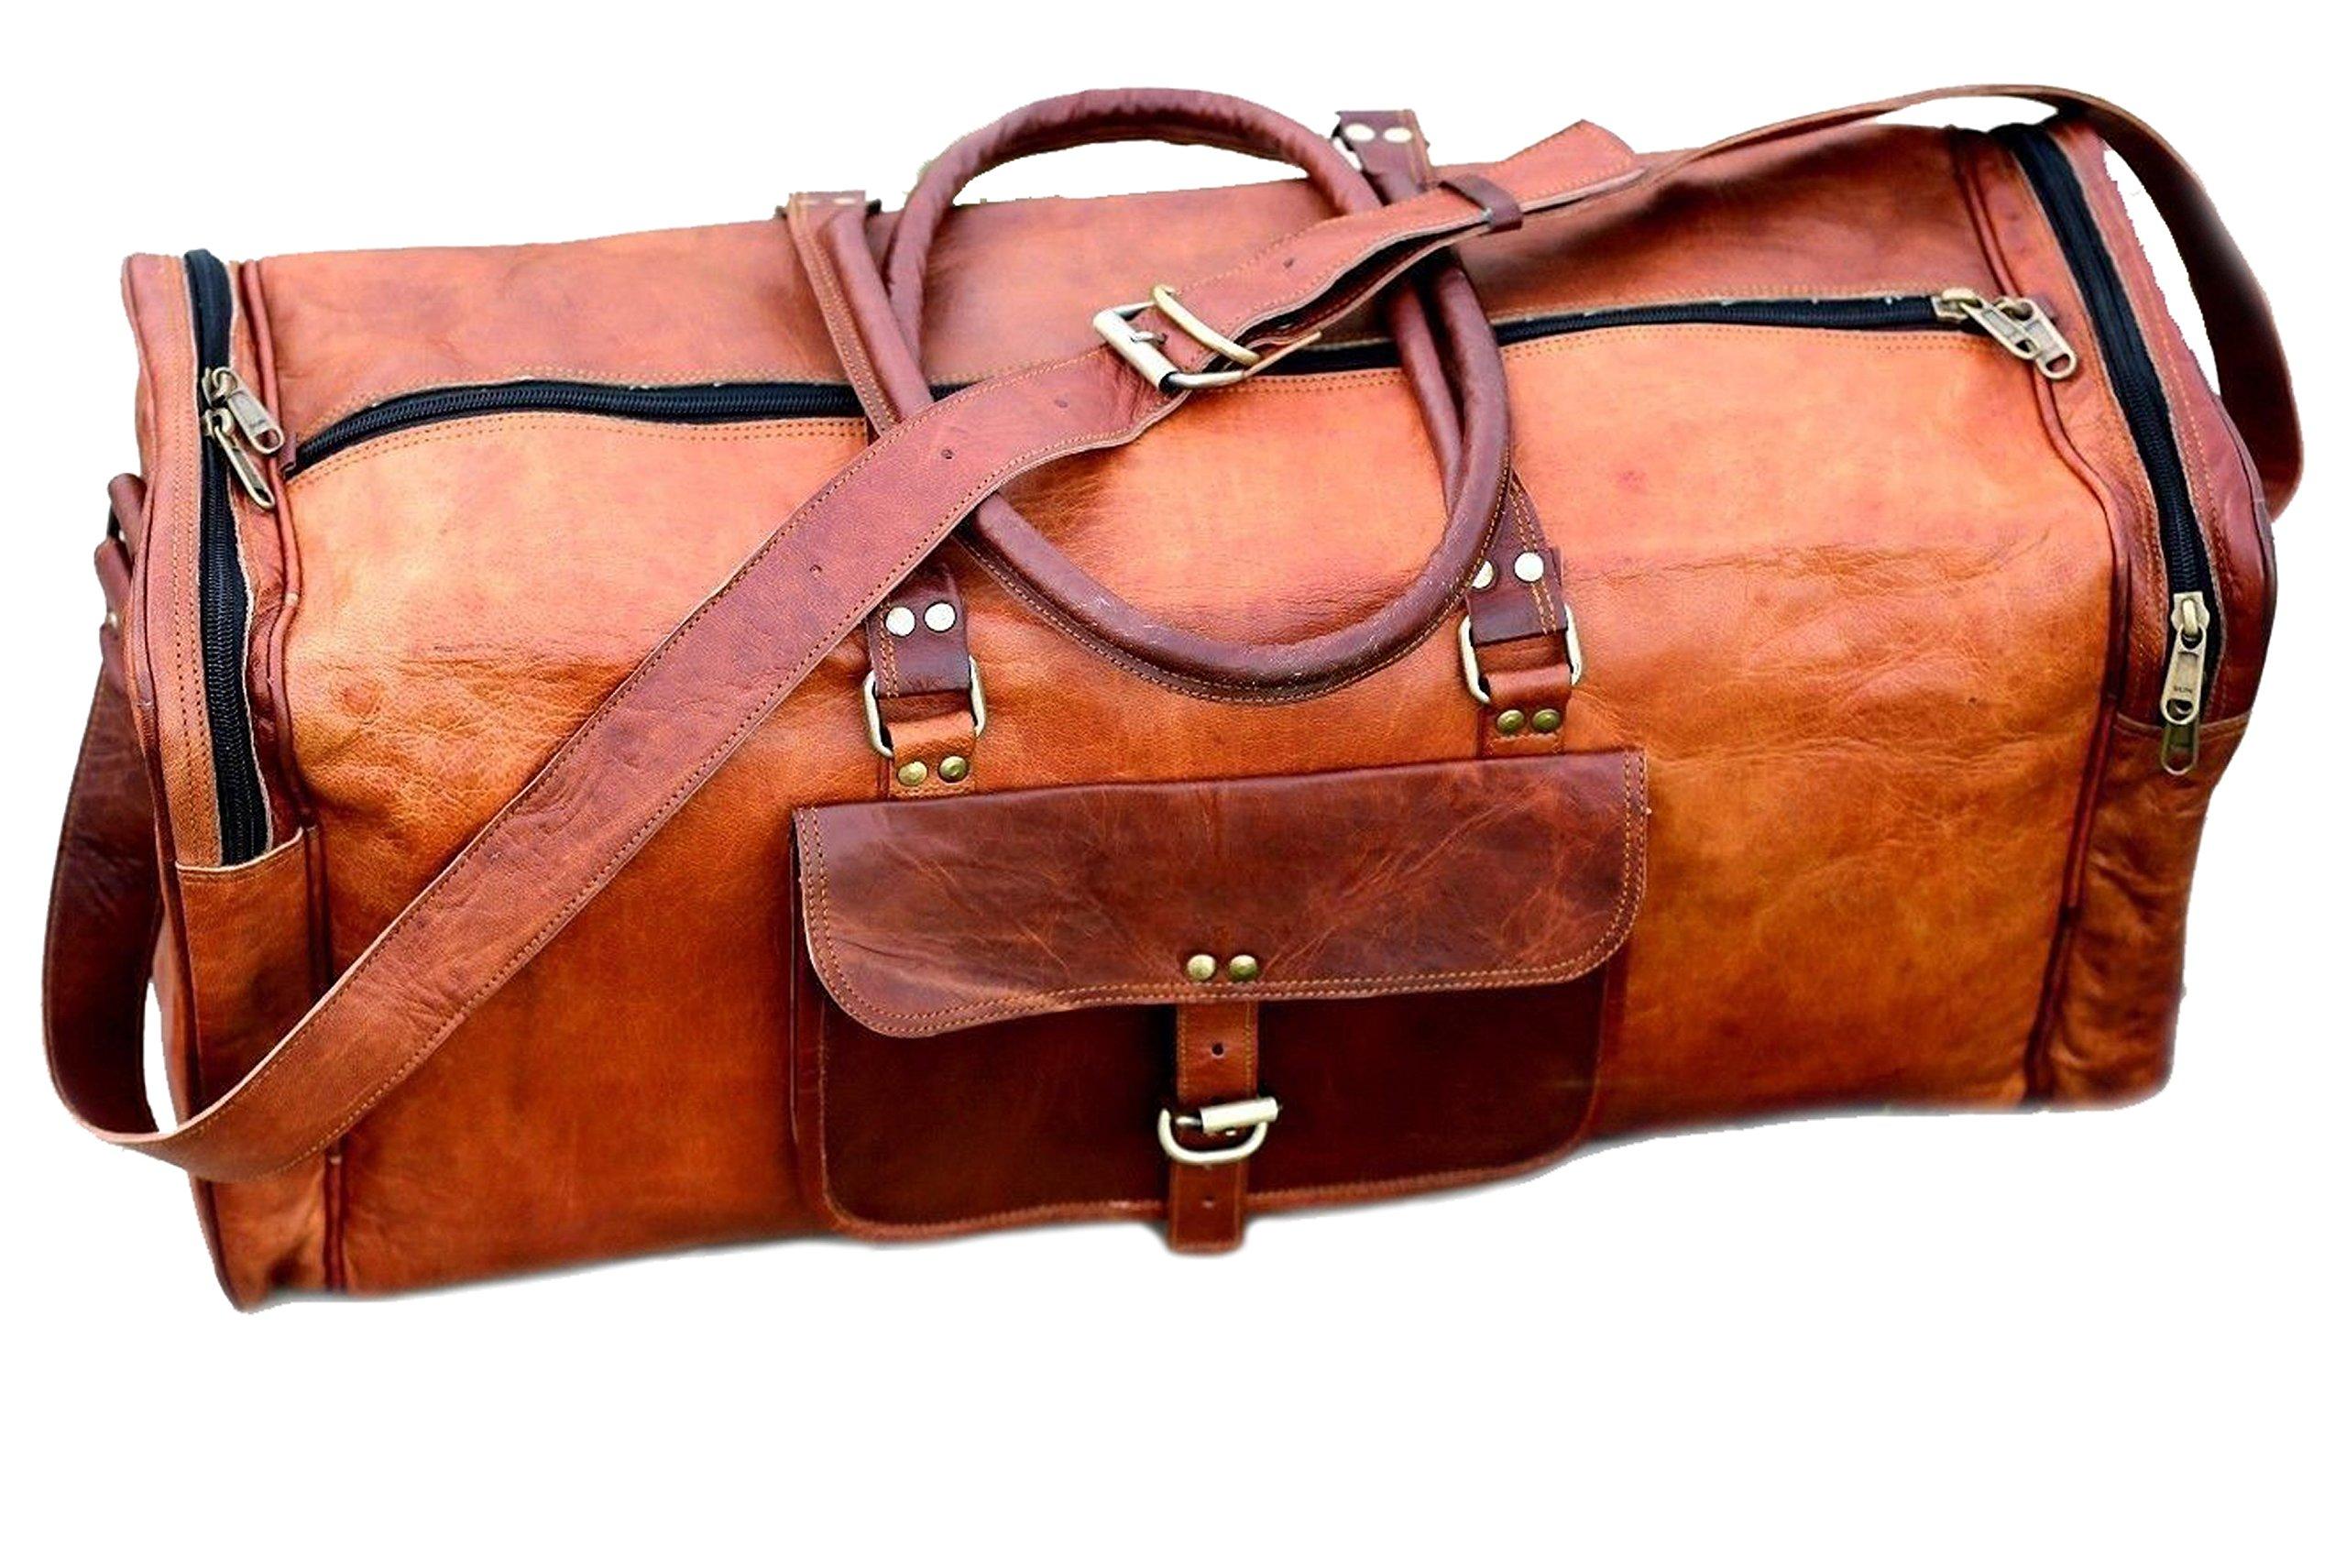 24 Inch Vintage Leather Duffel Travel Gym Sports Overnight Weekend Duffel Bag